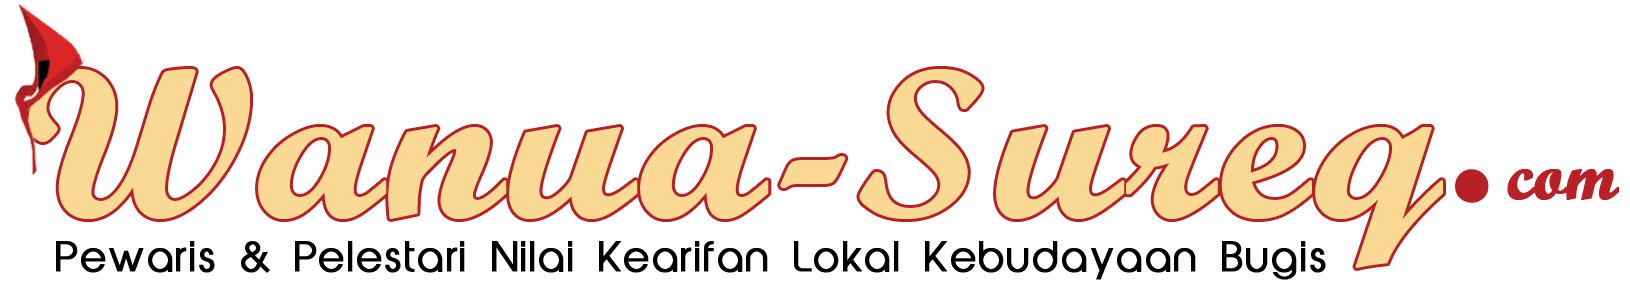 wanua-sureq-logo